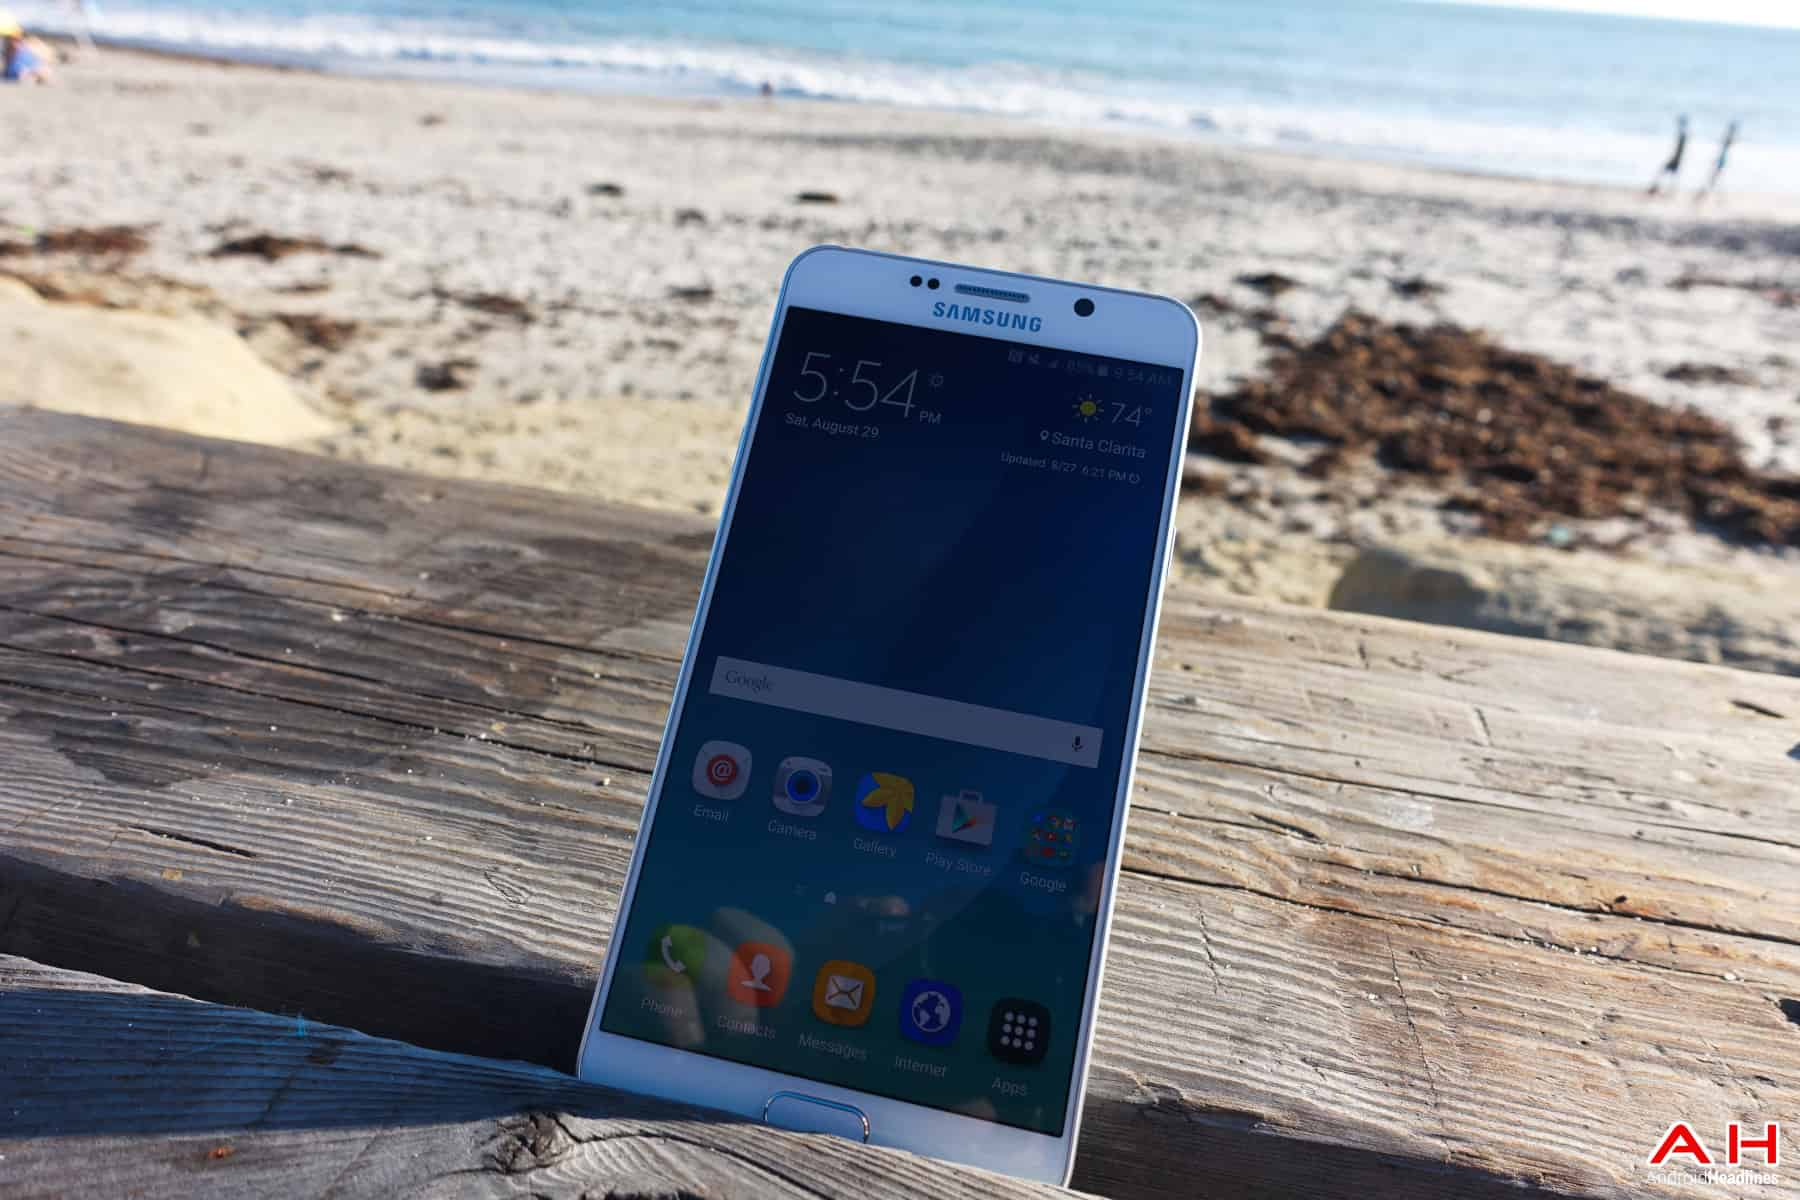 AH Samsung Galaxy Note 5 2015 Chris 23